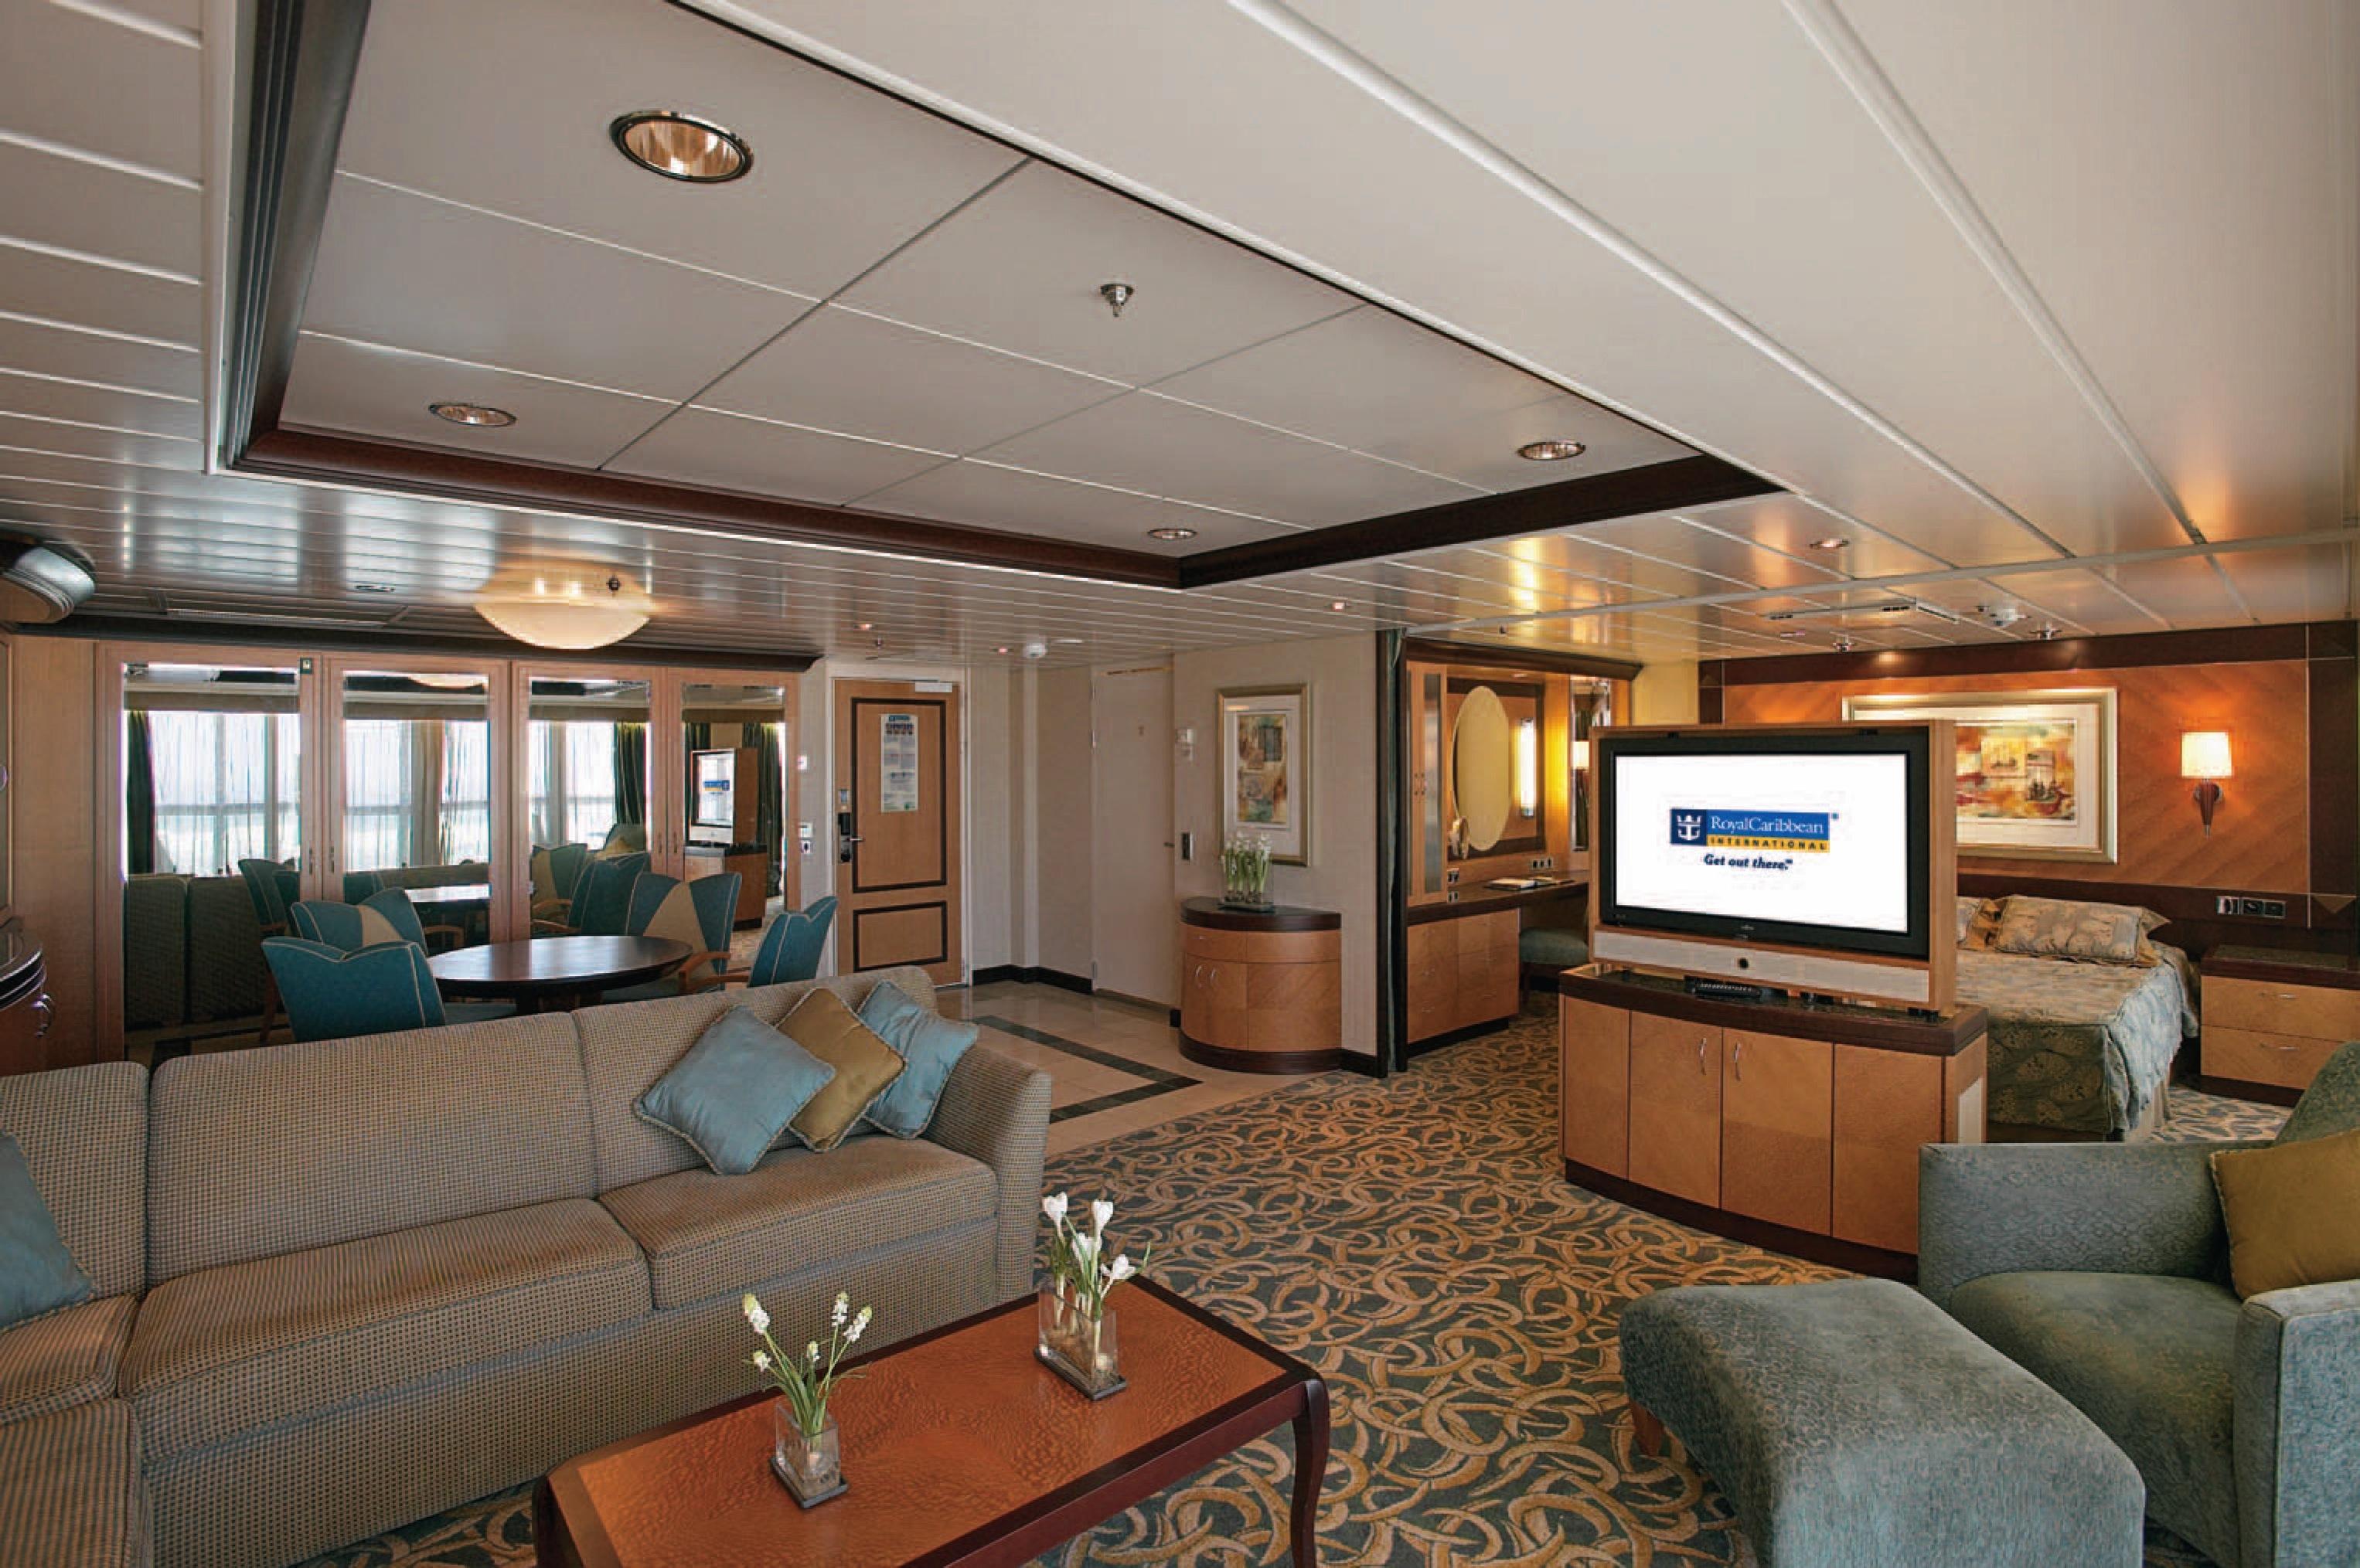 Royal Caribbean International Mariner of the Seas Accommodation Owner's Suite.jpg